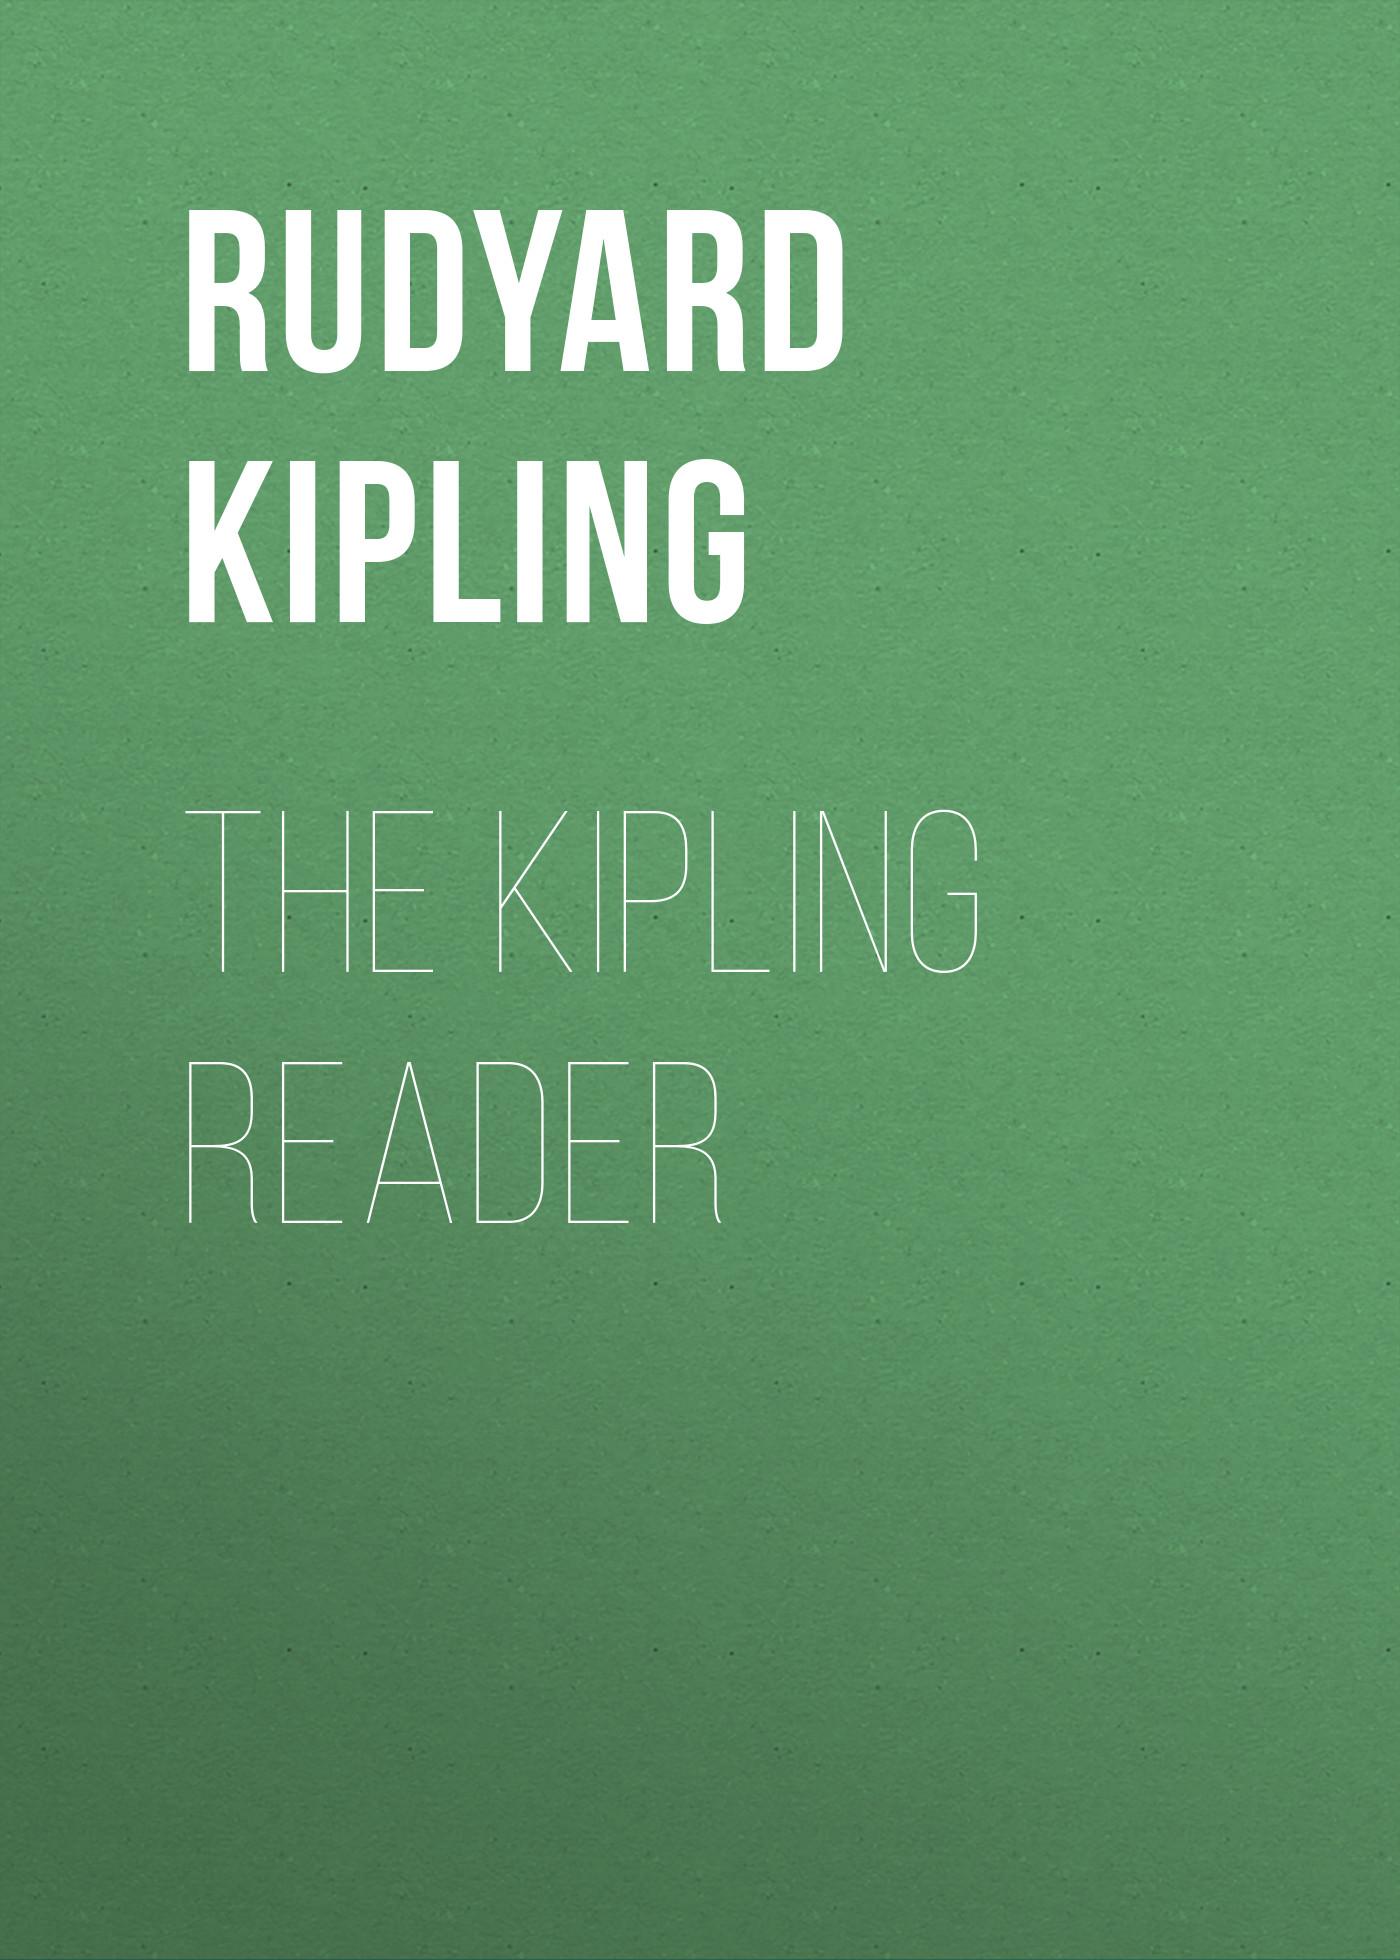 Редьярд Киплинг The Kipling Reader киплинг р kipling the second jungle book